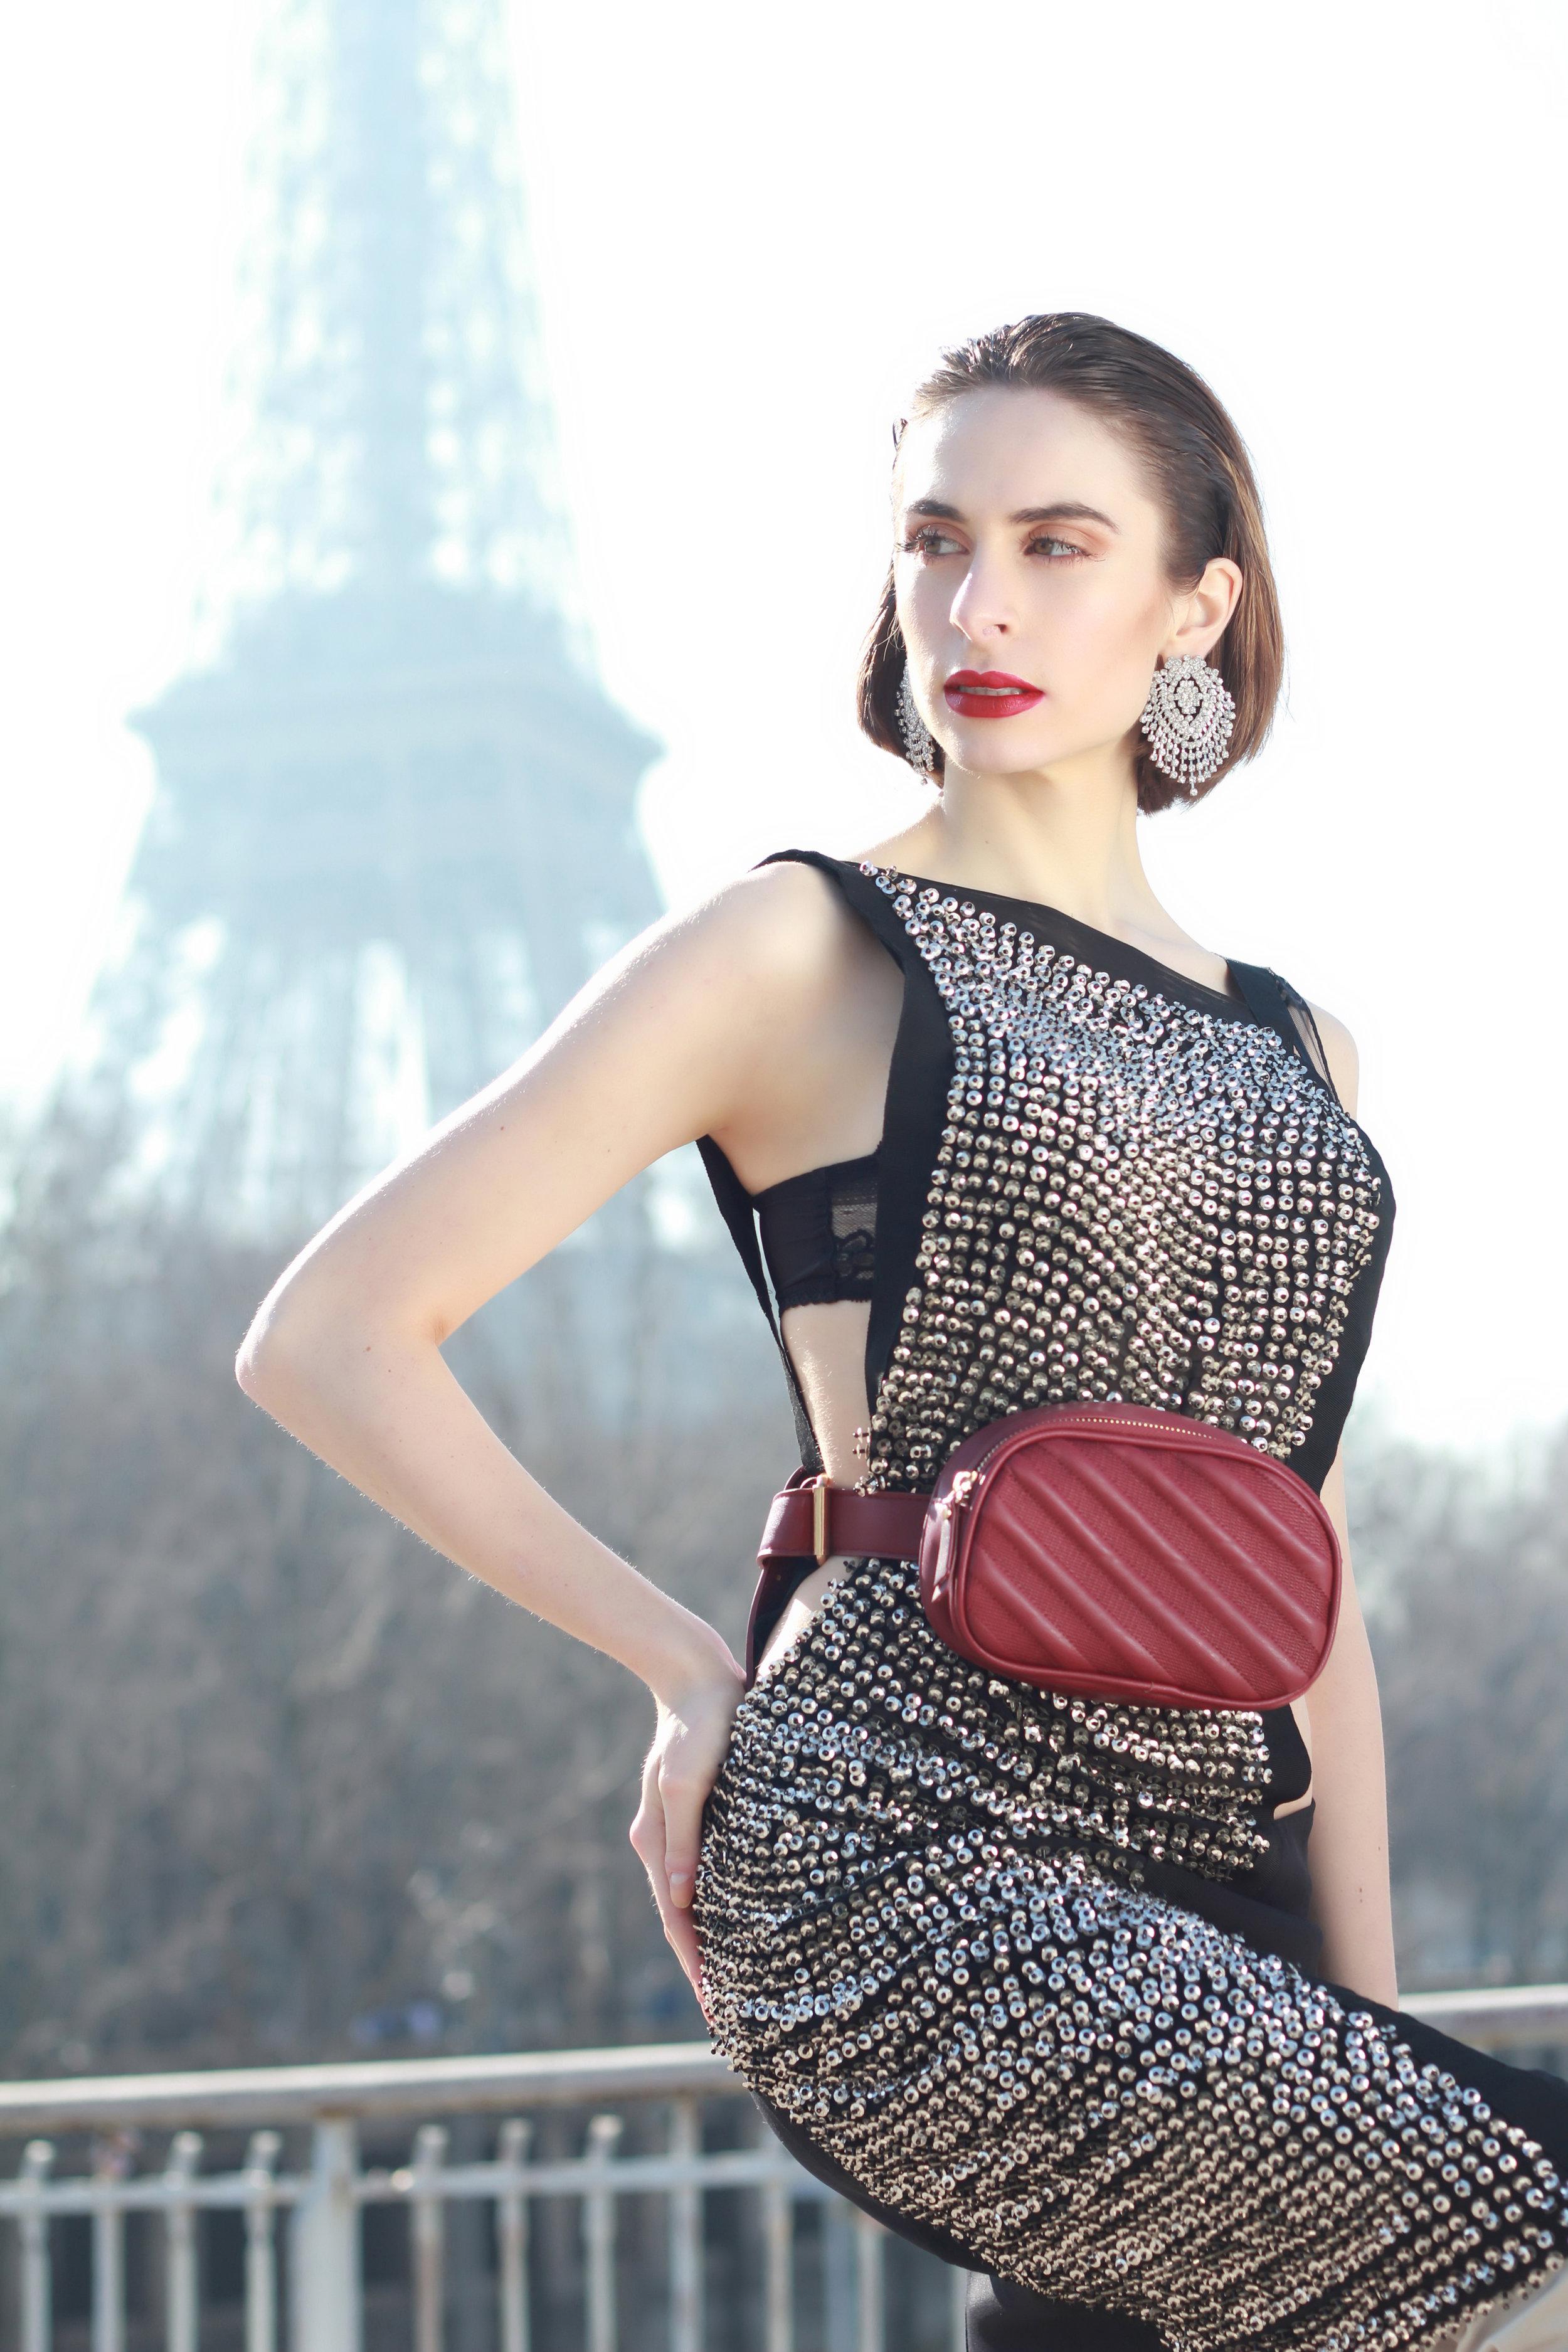 Dress : « The Uranie », Moira Cristescu  Bag : Michael Kors  Earring : Marina de Kent